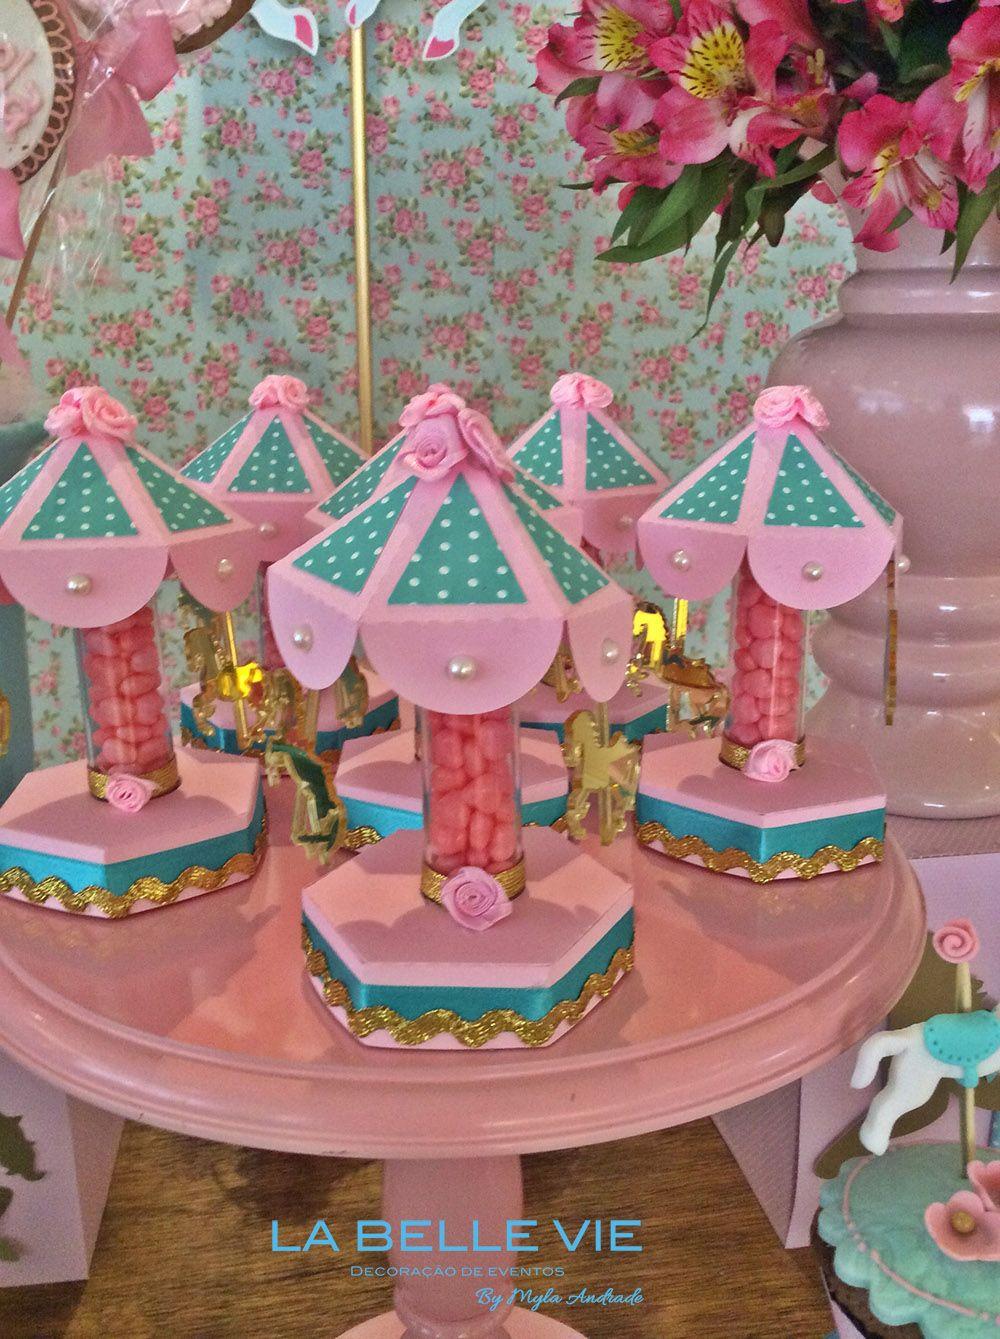 Circo rosa | Decorating | Pinterest | Circo, Carrusel y Cumple